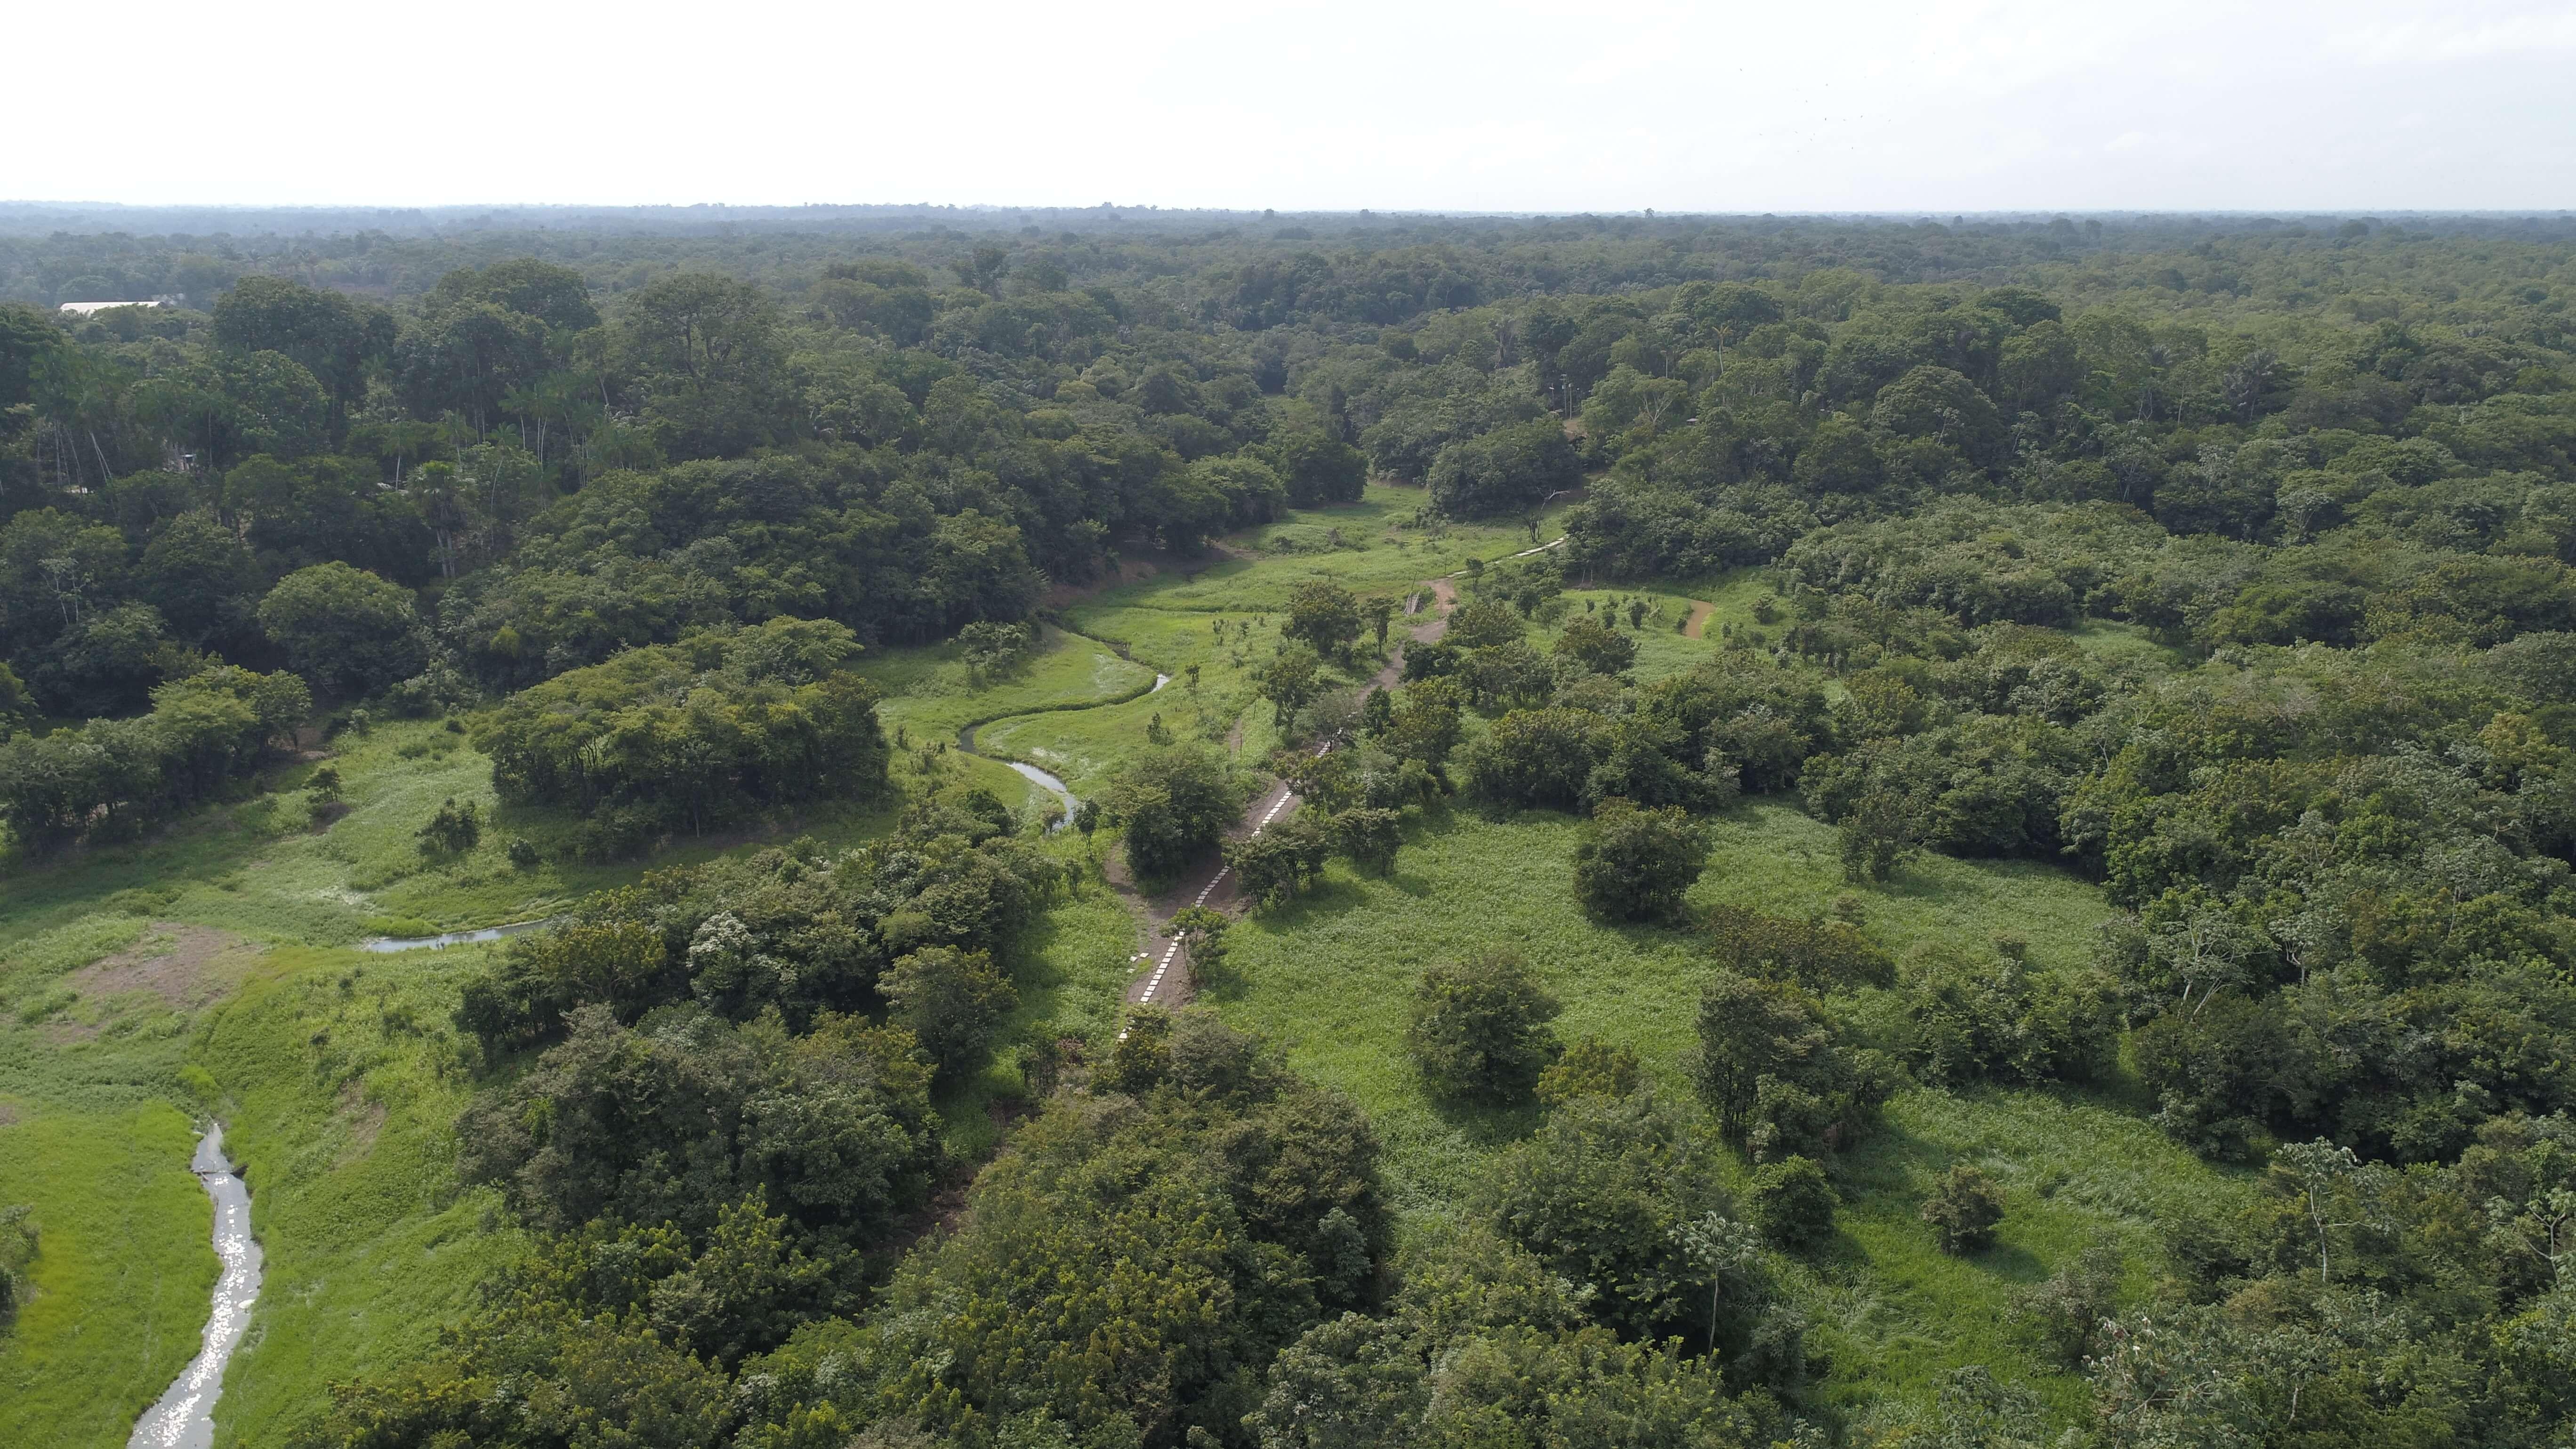 amazonas-rainforest-selva-1687373 (1).jpg